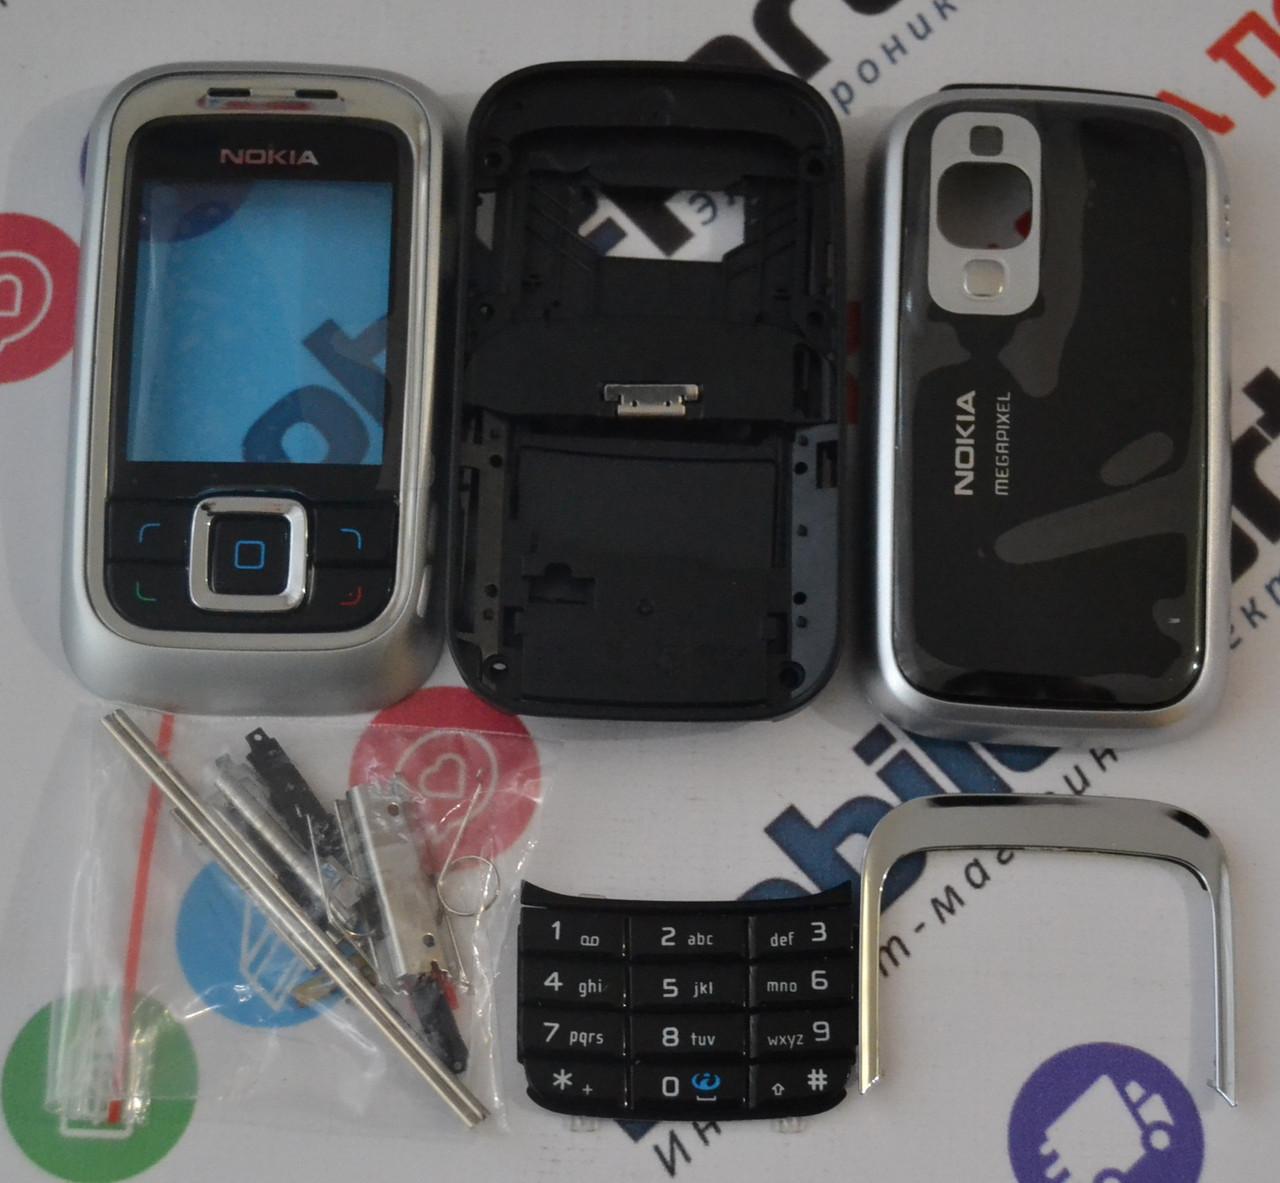 7504e714be9e Корпус для телефона Nokia 6111 в сборе (Качество ААА) (Серый) Распродажа!